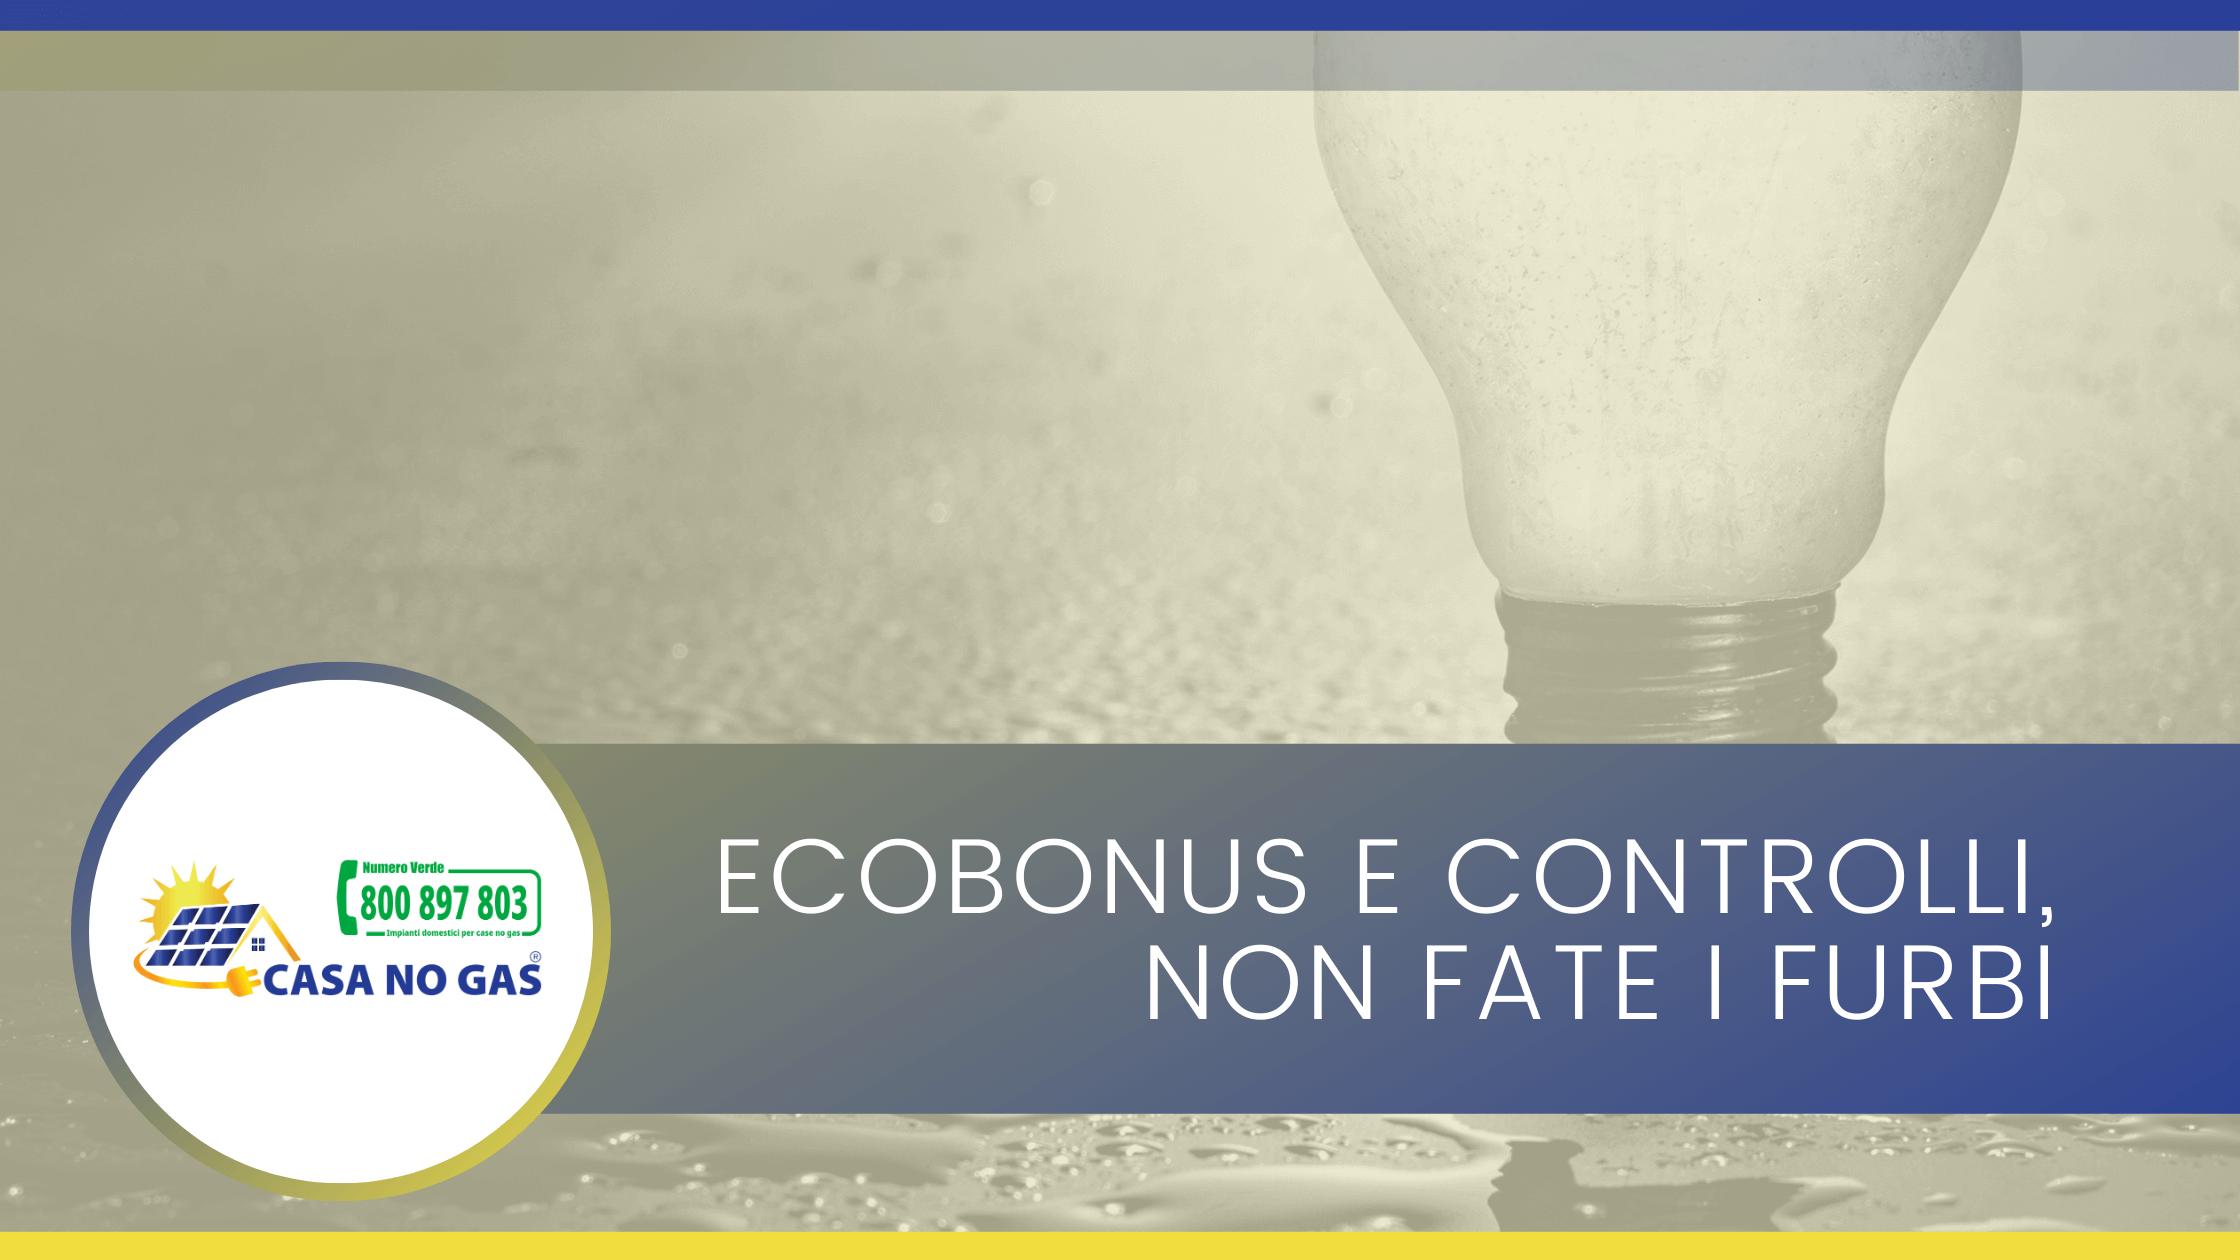 Ecobonus e controlli non fate i furbi